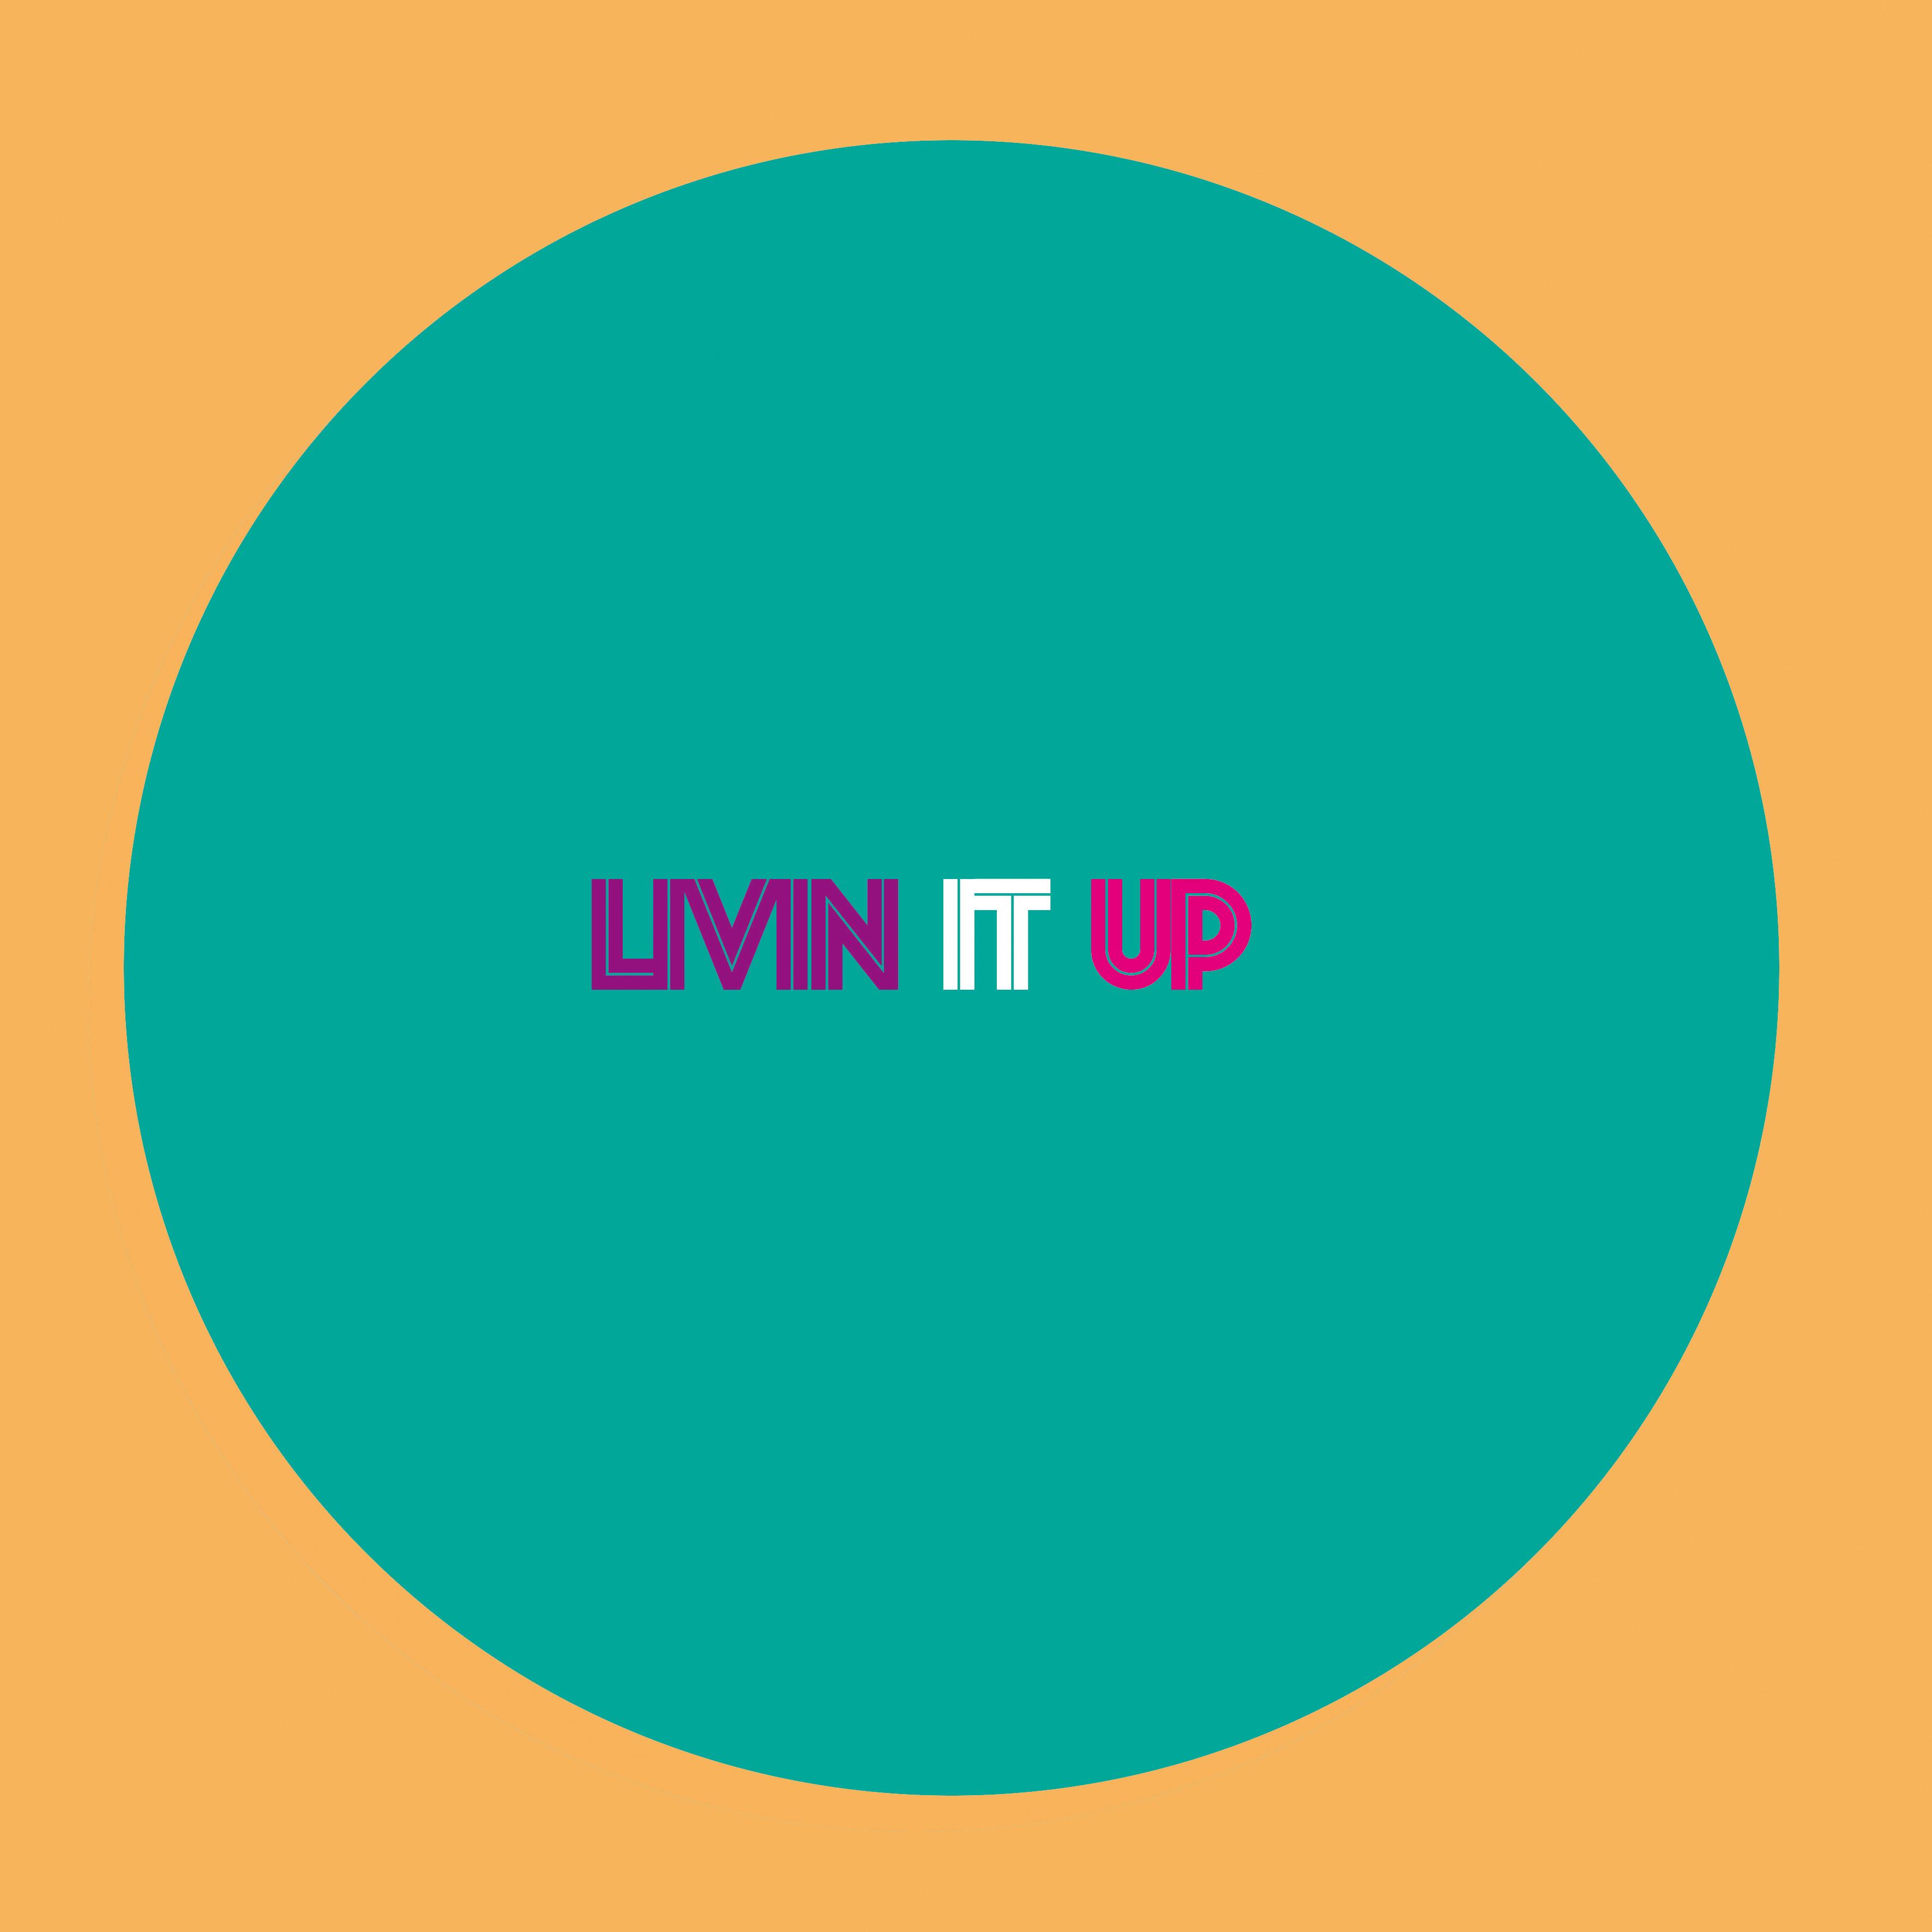 Livin it UP 1.jpg